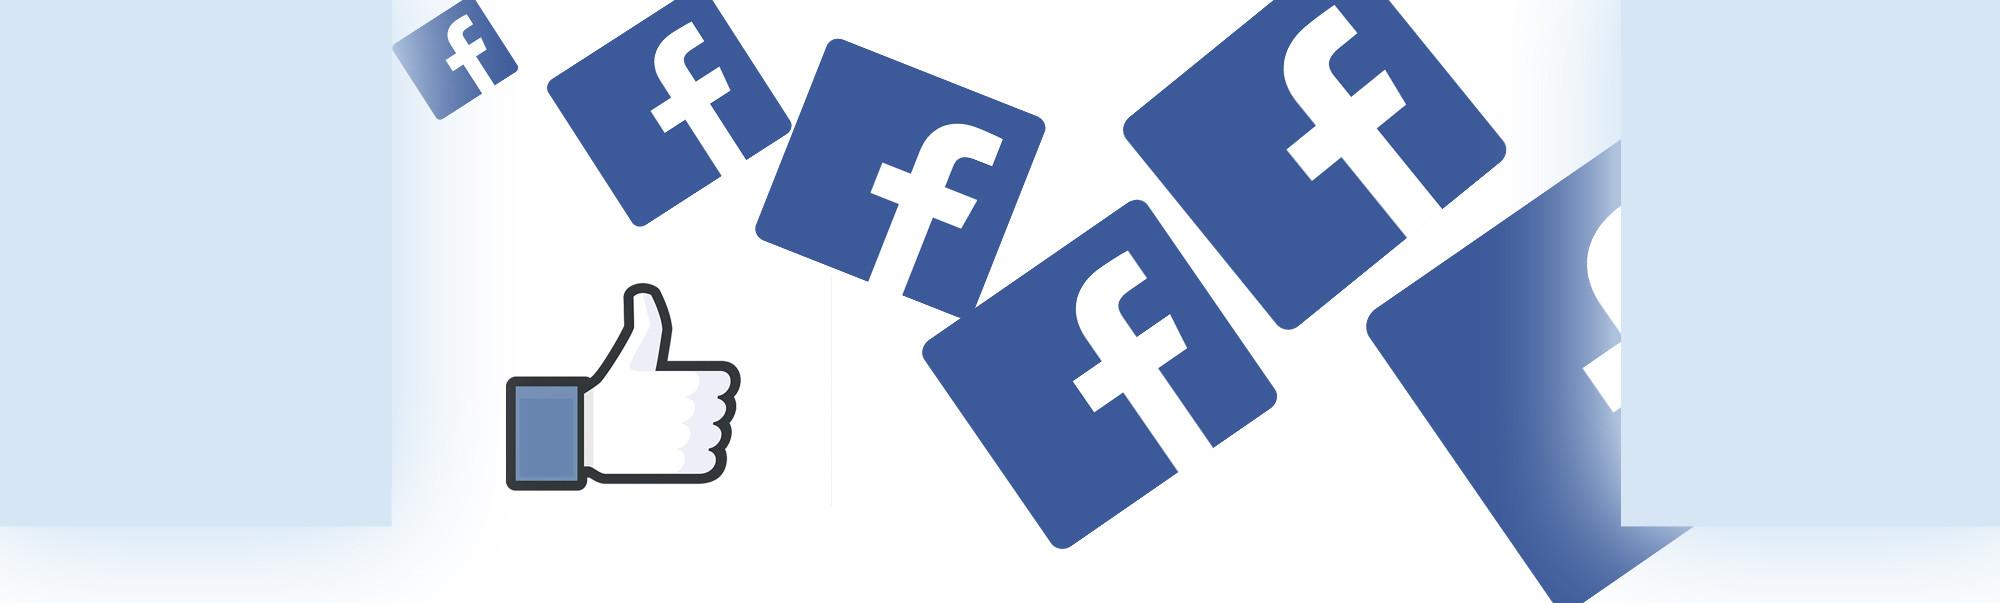 https://www.facebook.com/erlebnisverleih/